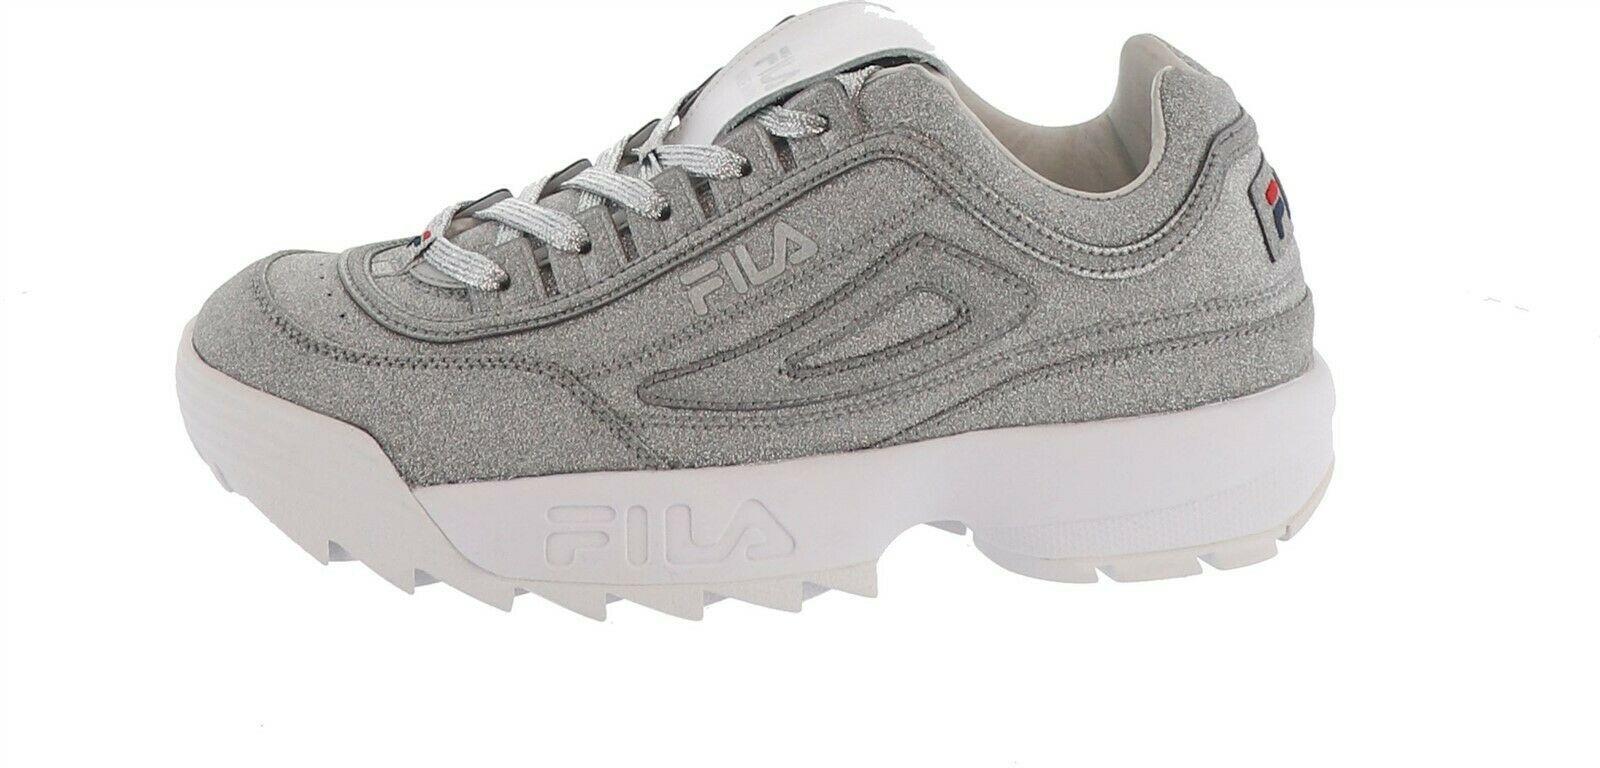 FILA Sparkle Platform Chunky Sneaker Disruptor Metallic Silver 8.5M NEW S9461 - $76.21